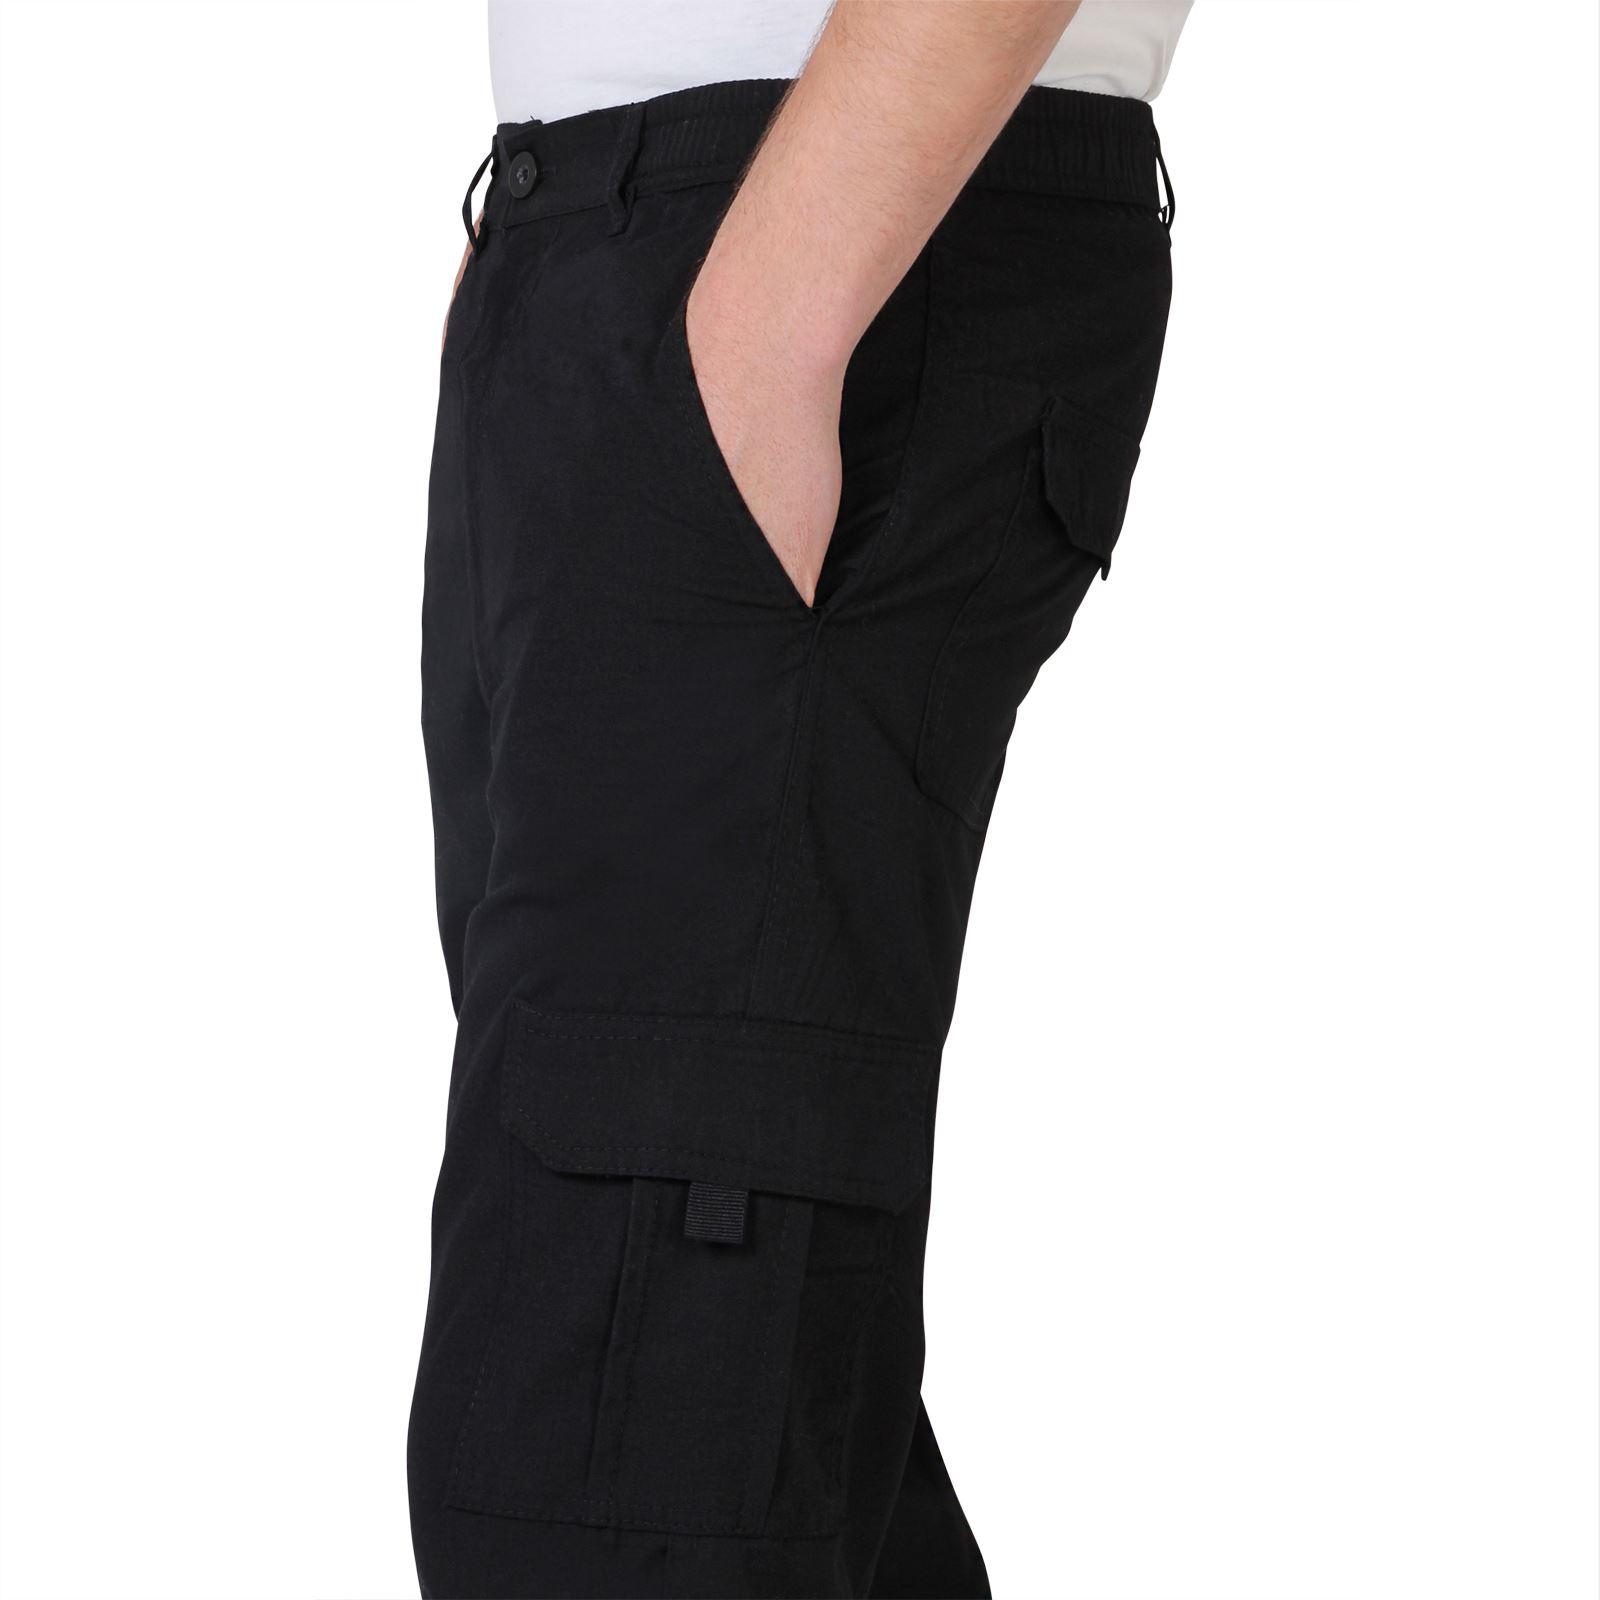 Pantalones-Hombre-Estilo-Cargo-Militar-Combate-Multibolsillos-Casual miniatura 27